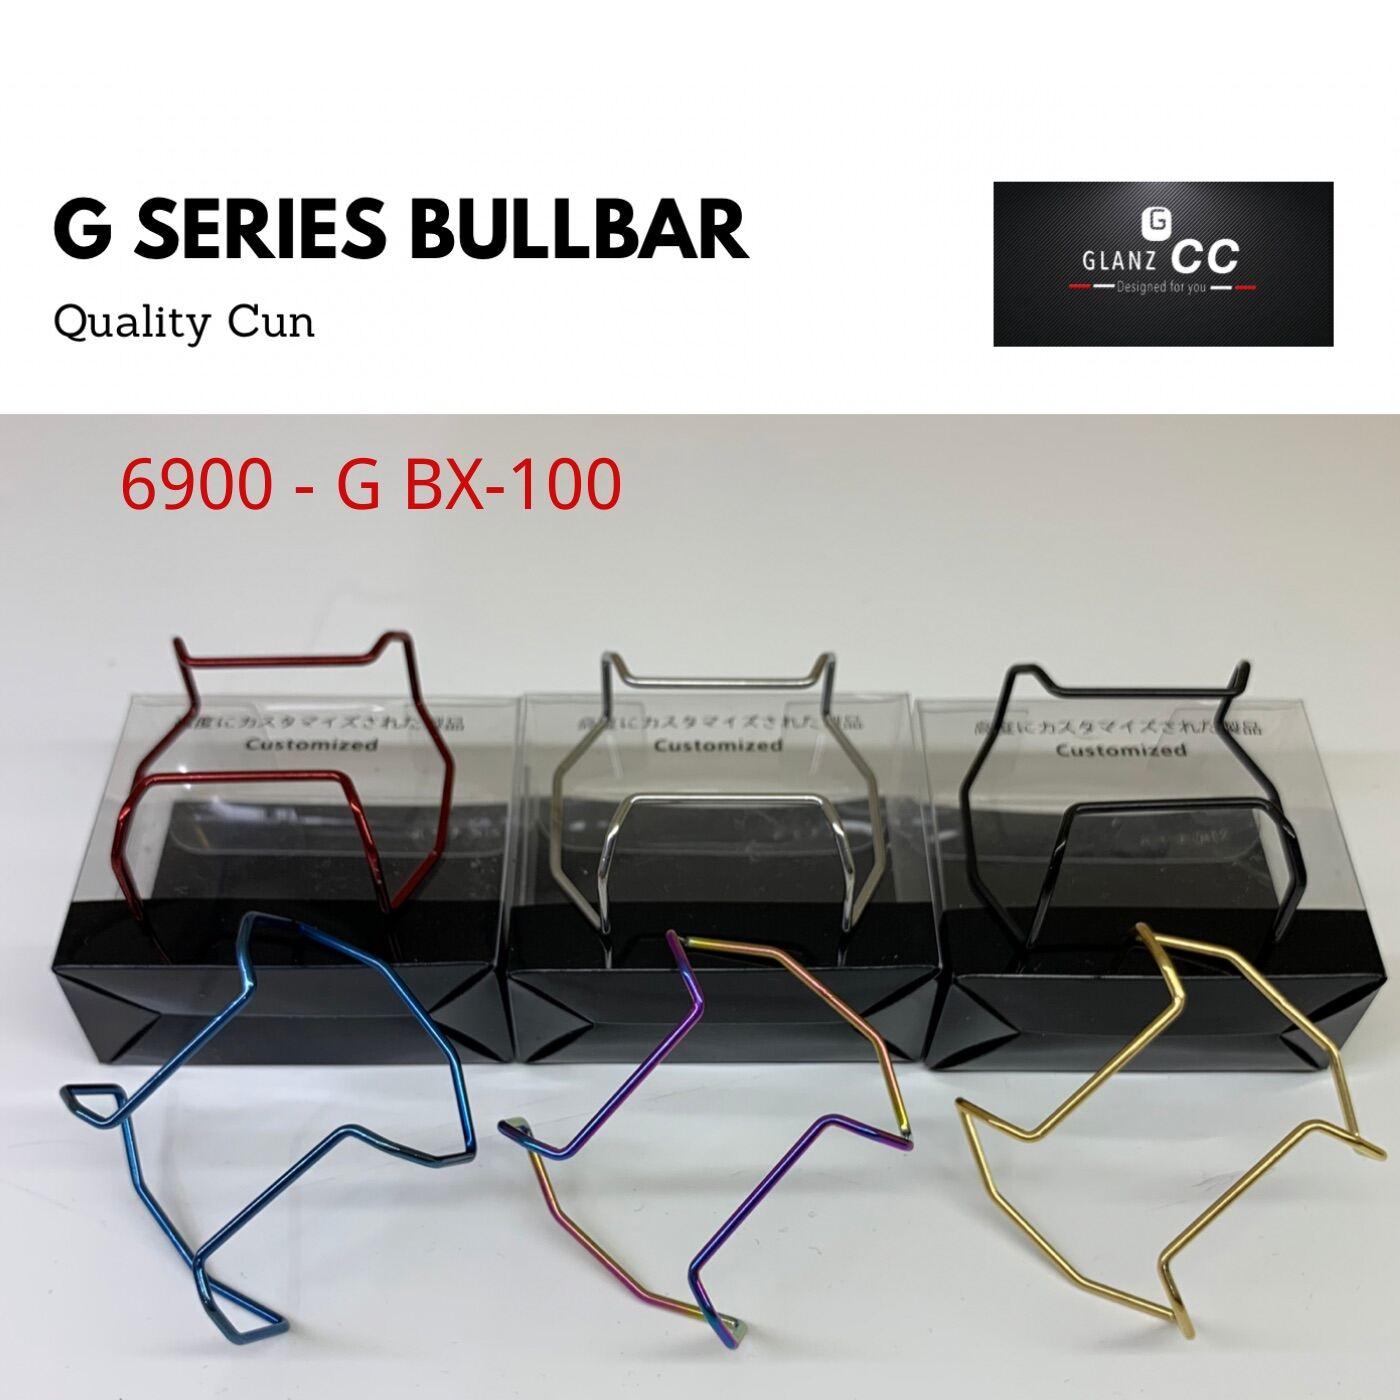 Watch Protection Case Bullbar Bumber 6900 GBX 100 Malaysia